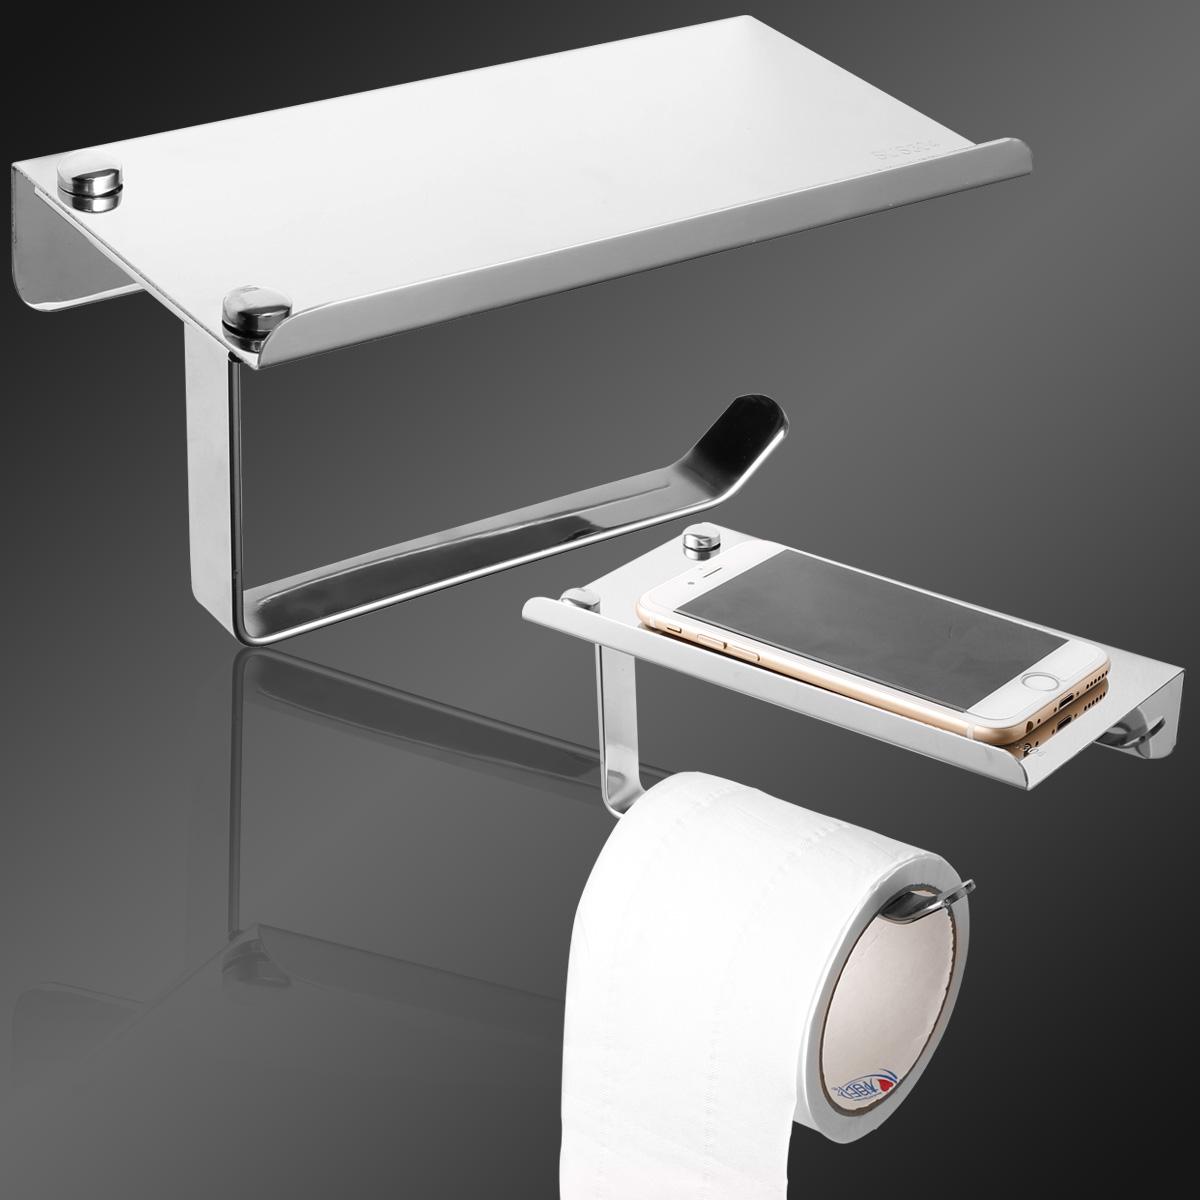 stainless steel wall mounted bathroom toilet paper holder tissue bar shelf ebay. Black Bedroom Furniture Sets. Home Design Ideas